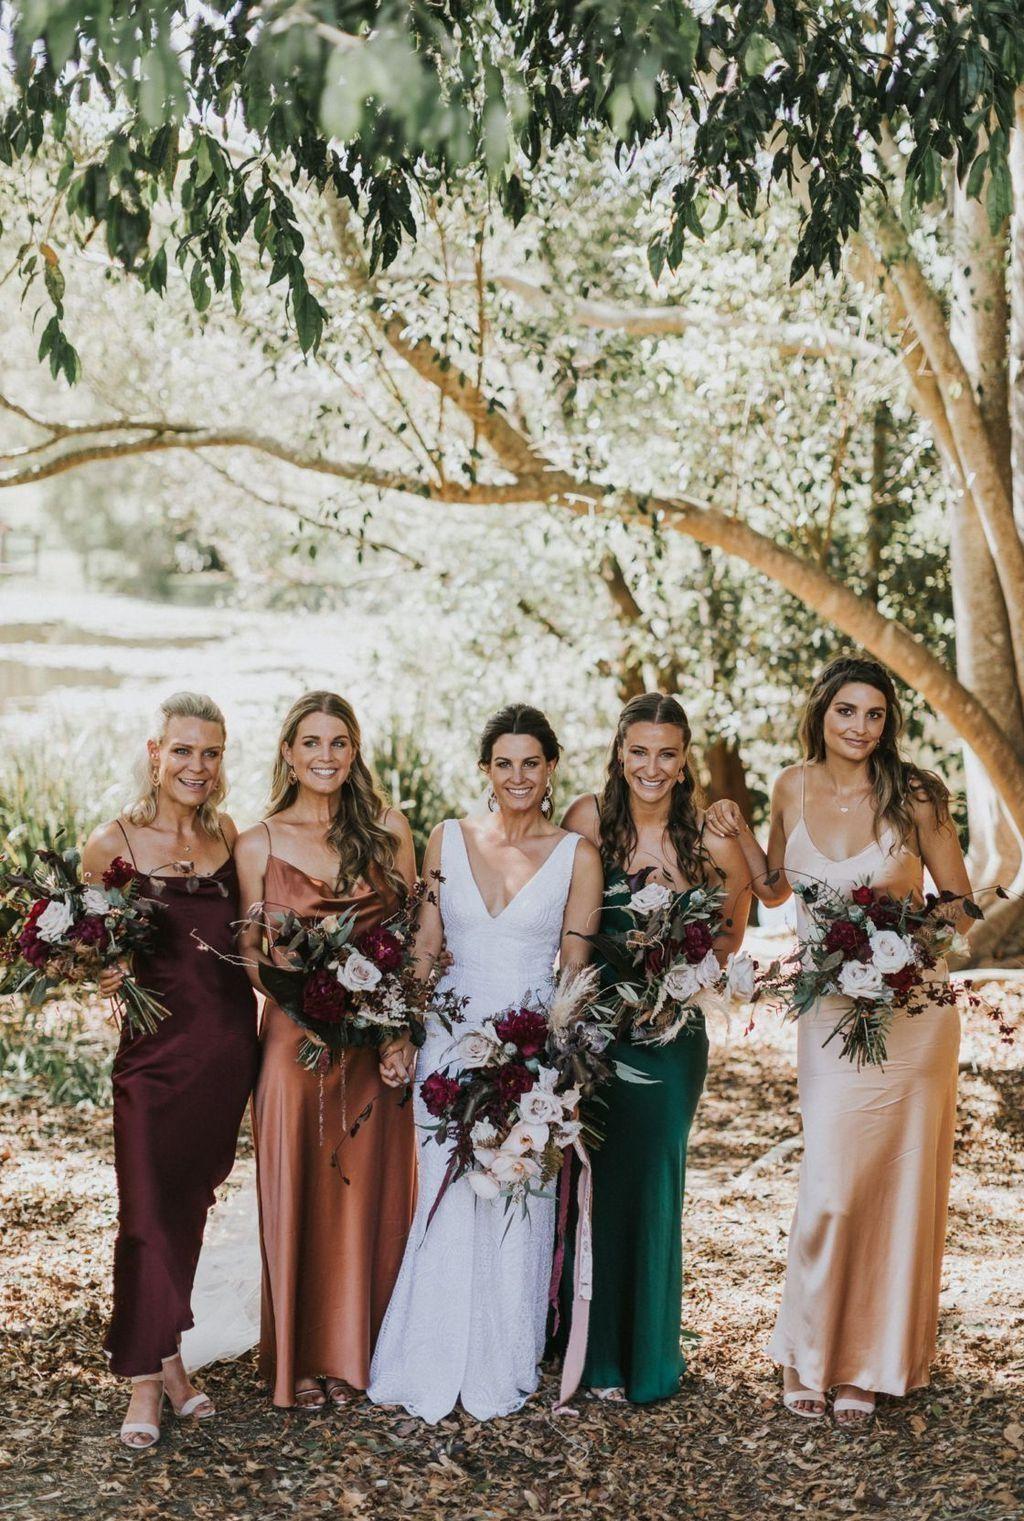 party dress express bridesmaid dresses